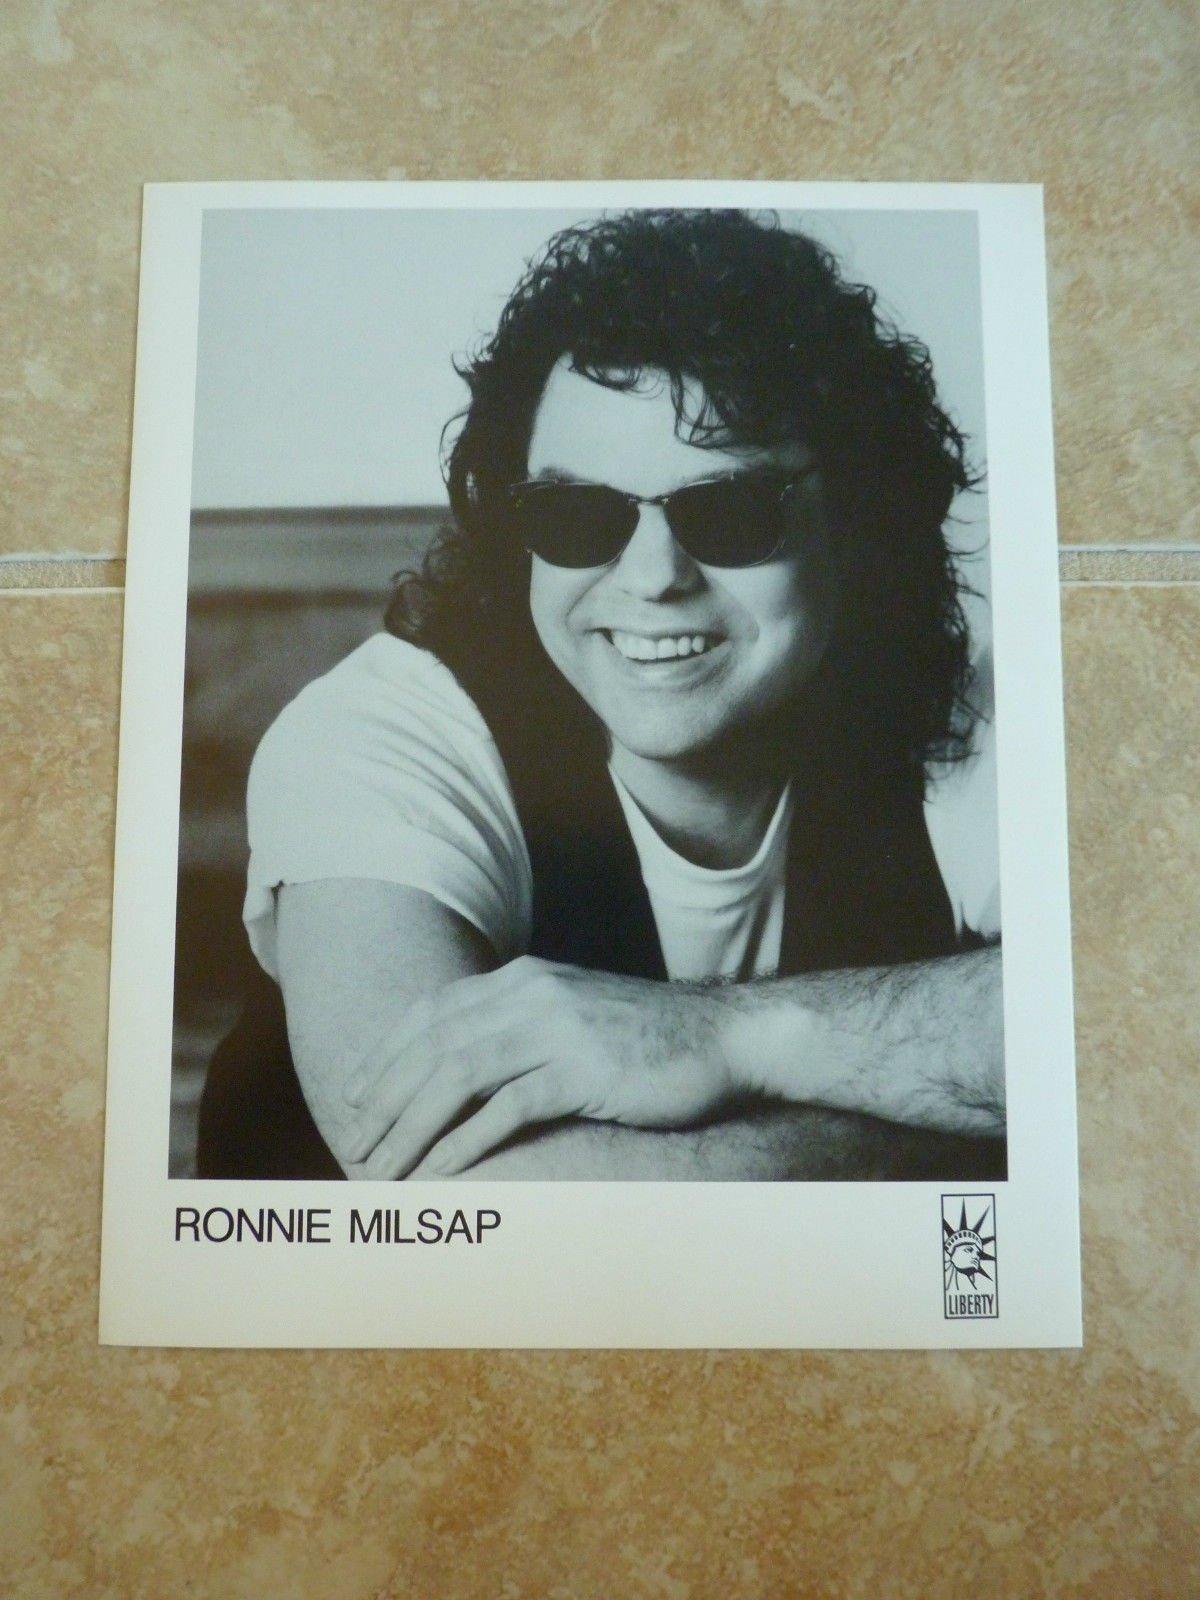 Happy Birthday, Ronnie Milsap!